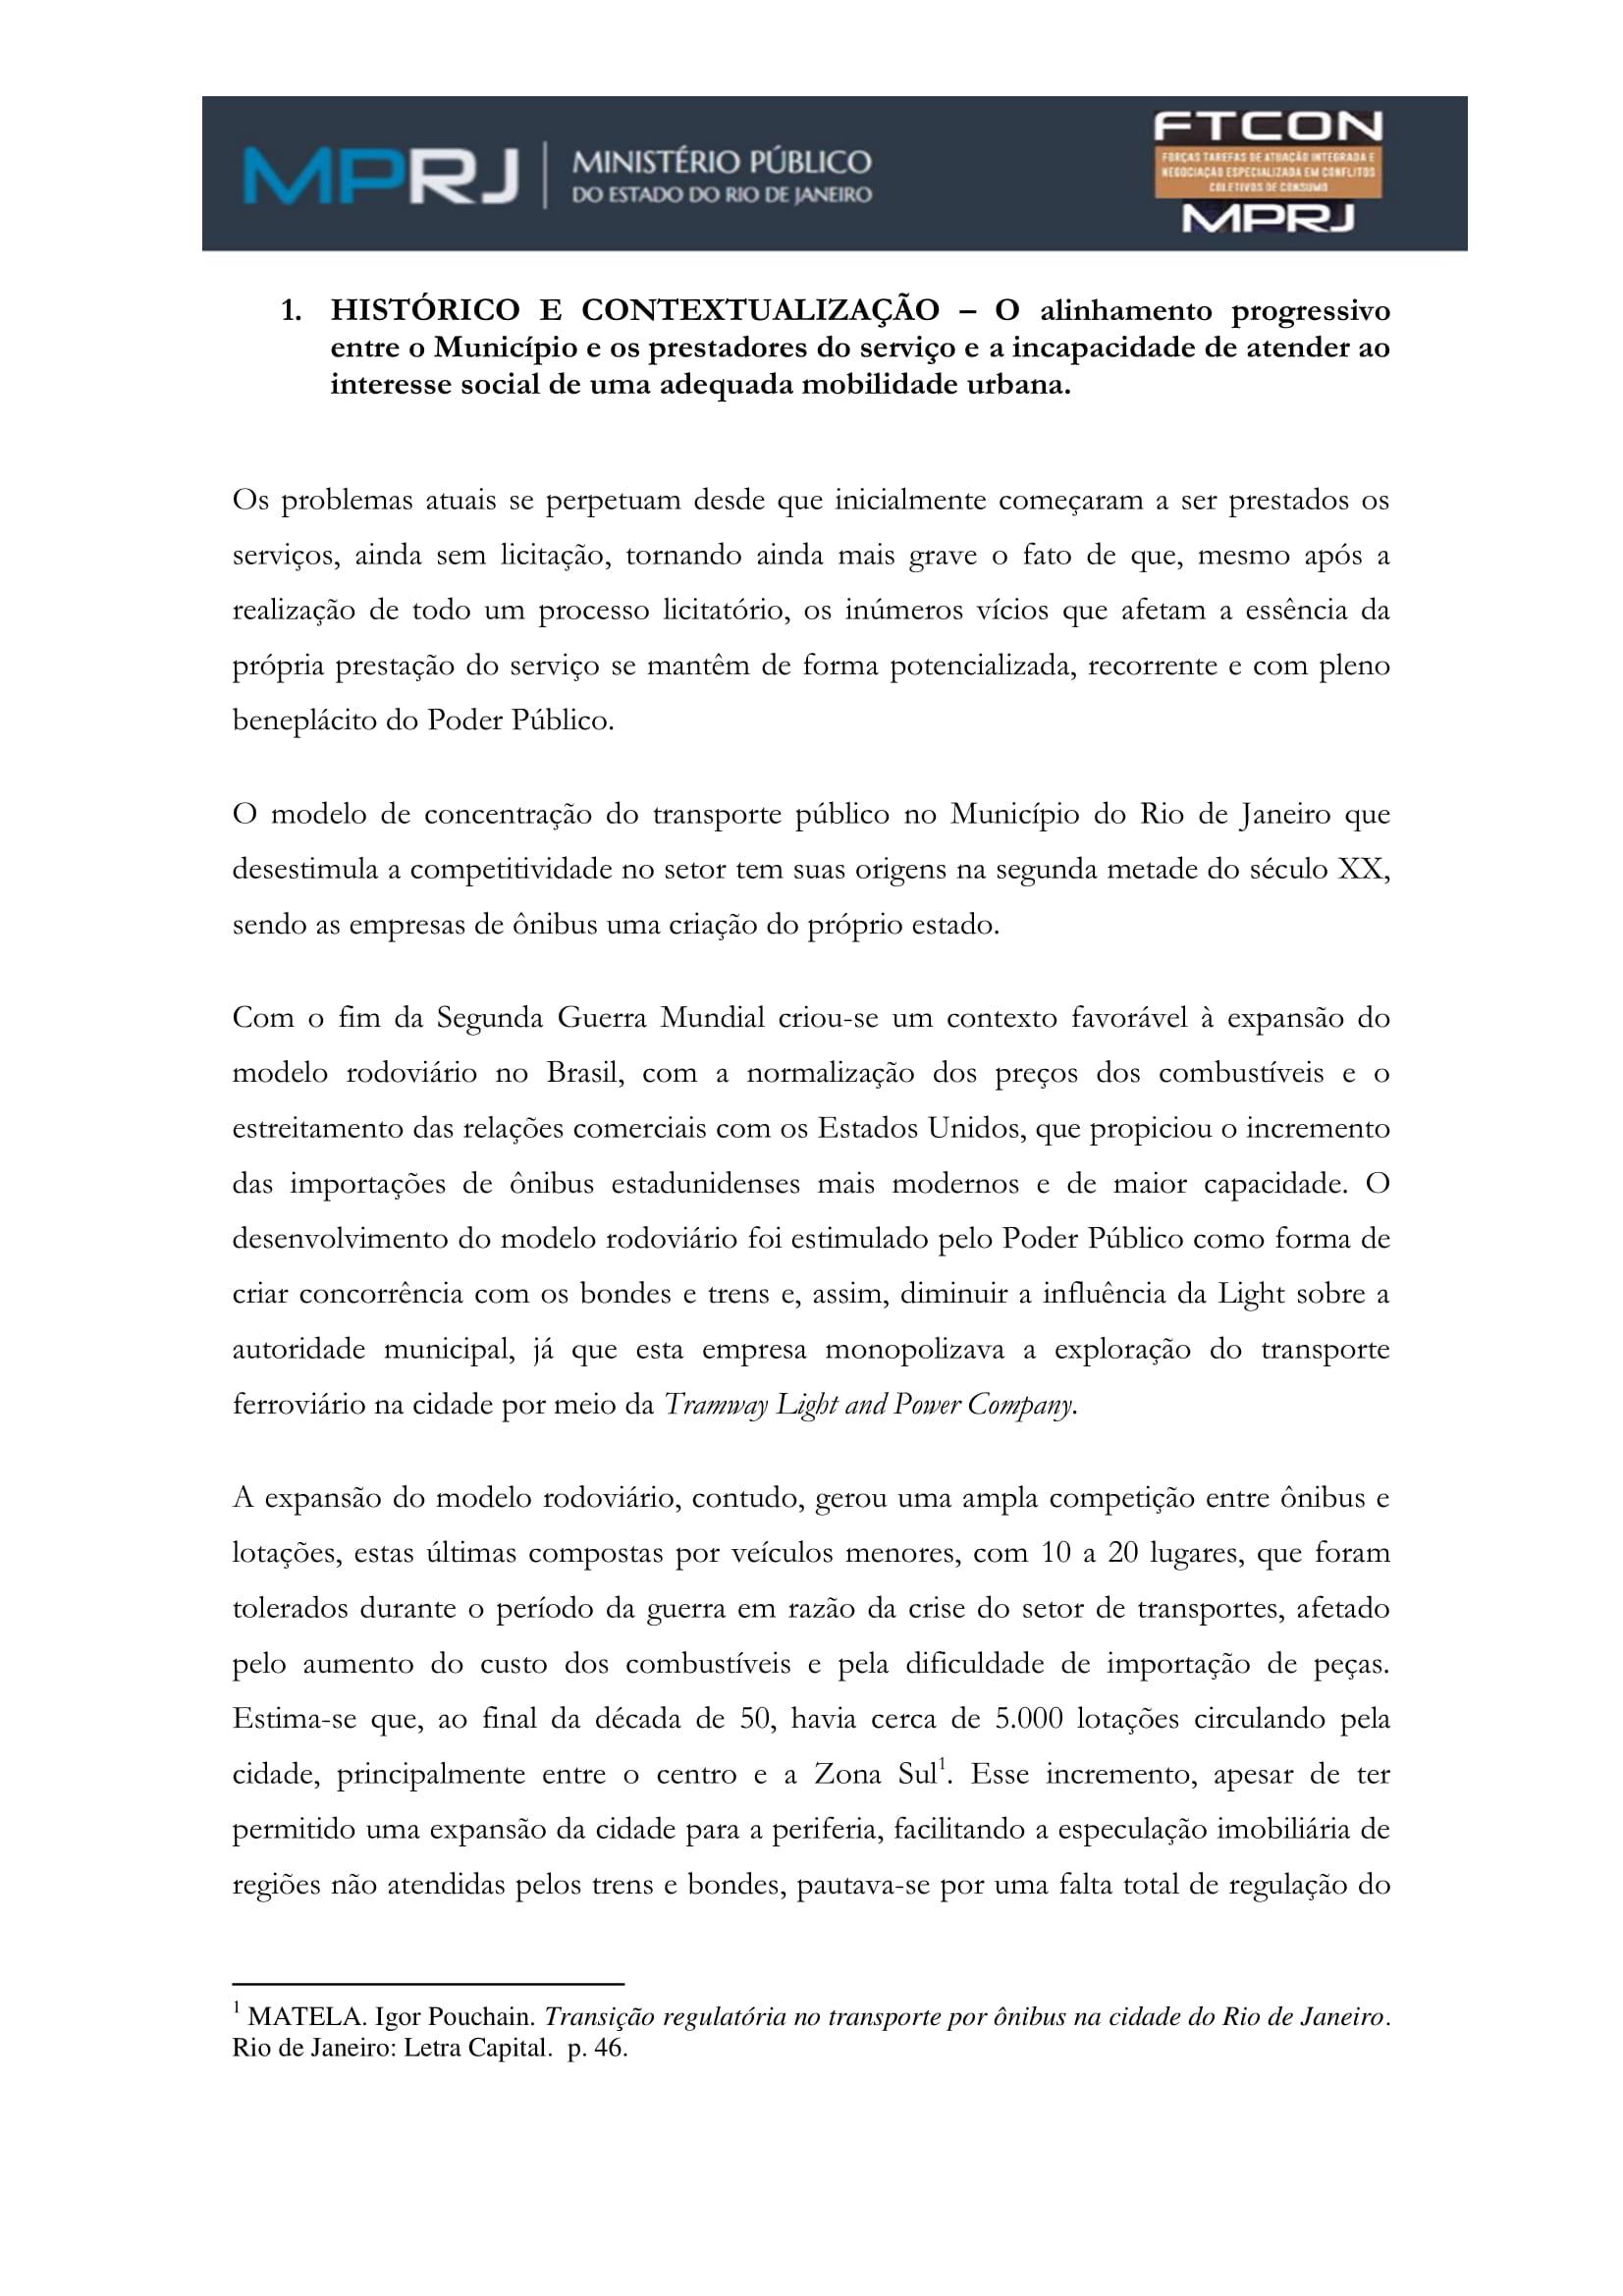 acp_caducidade_onibus_dr_rt-006